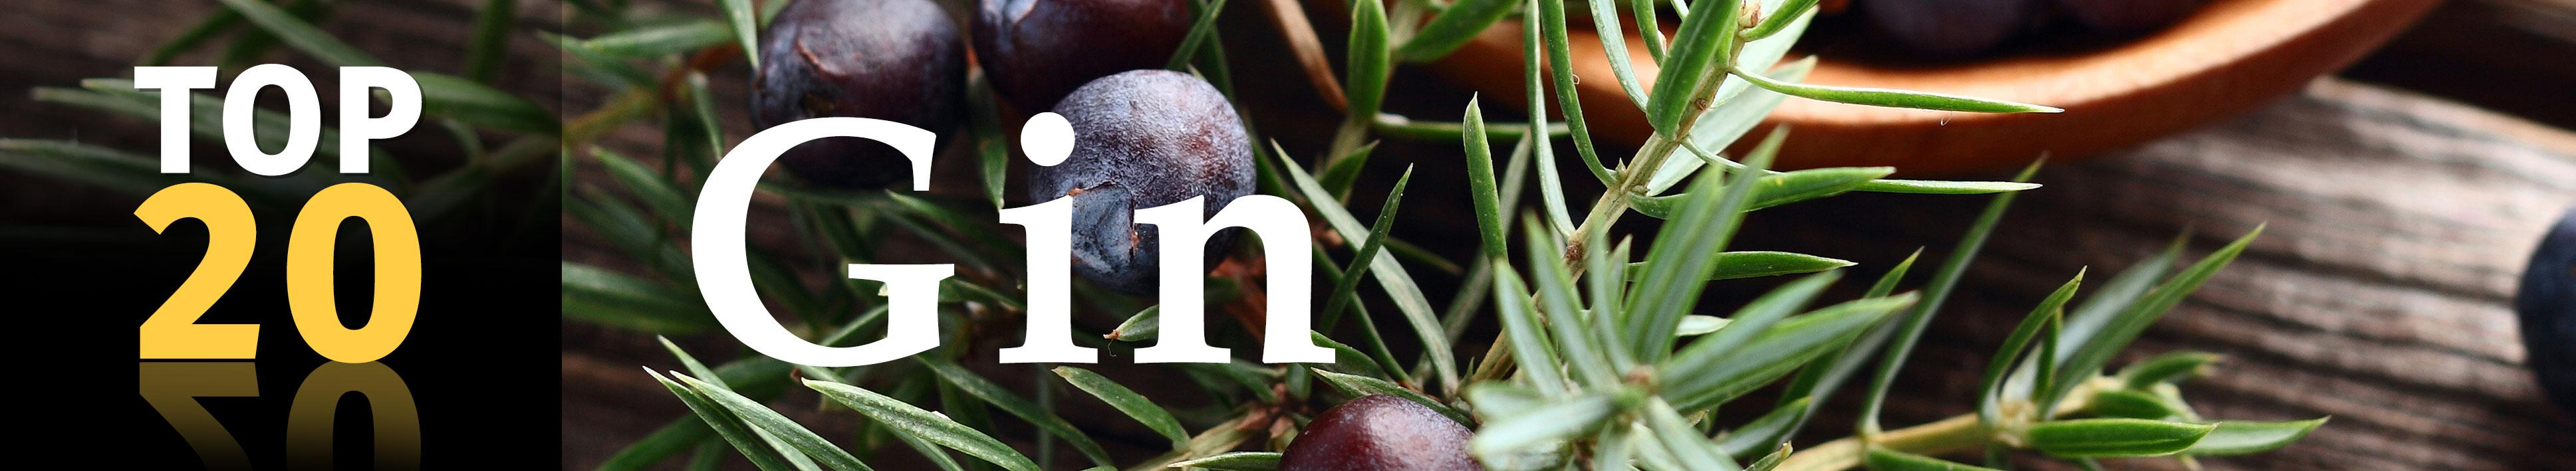 Top 20 Gins im Angebot